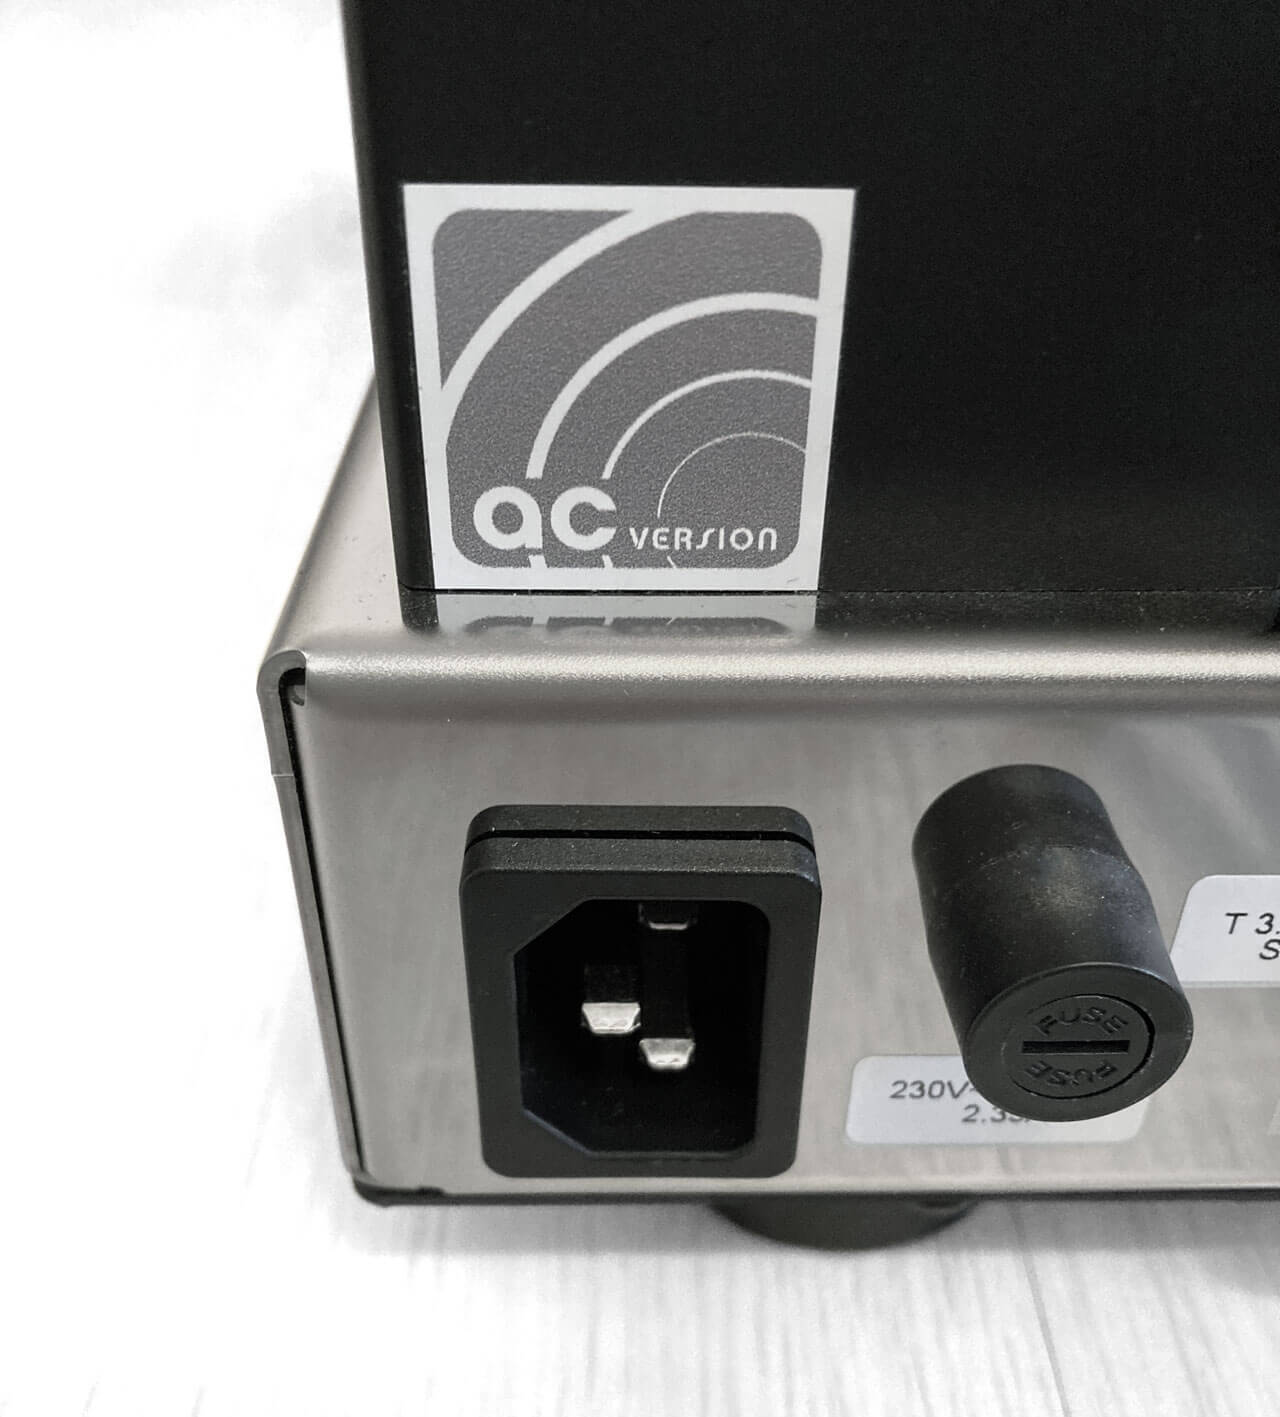 McIntosh MA8900 AC von Audio Components